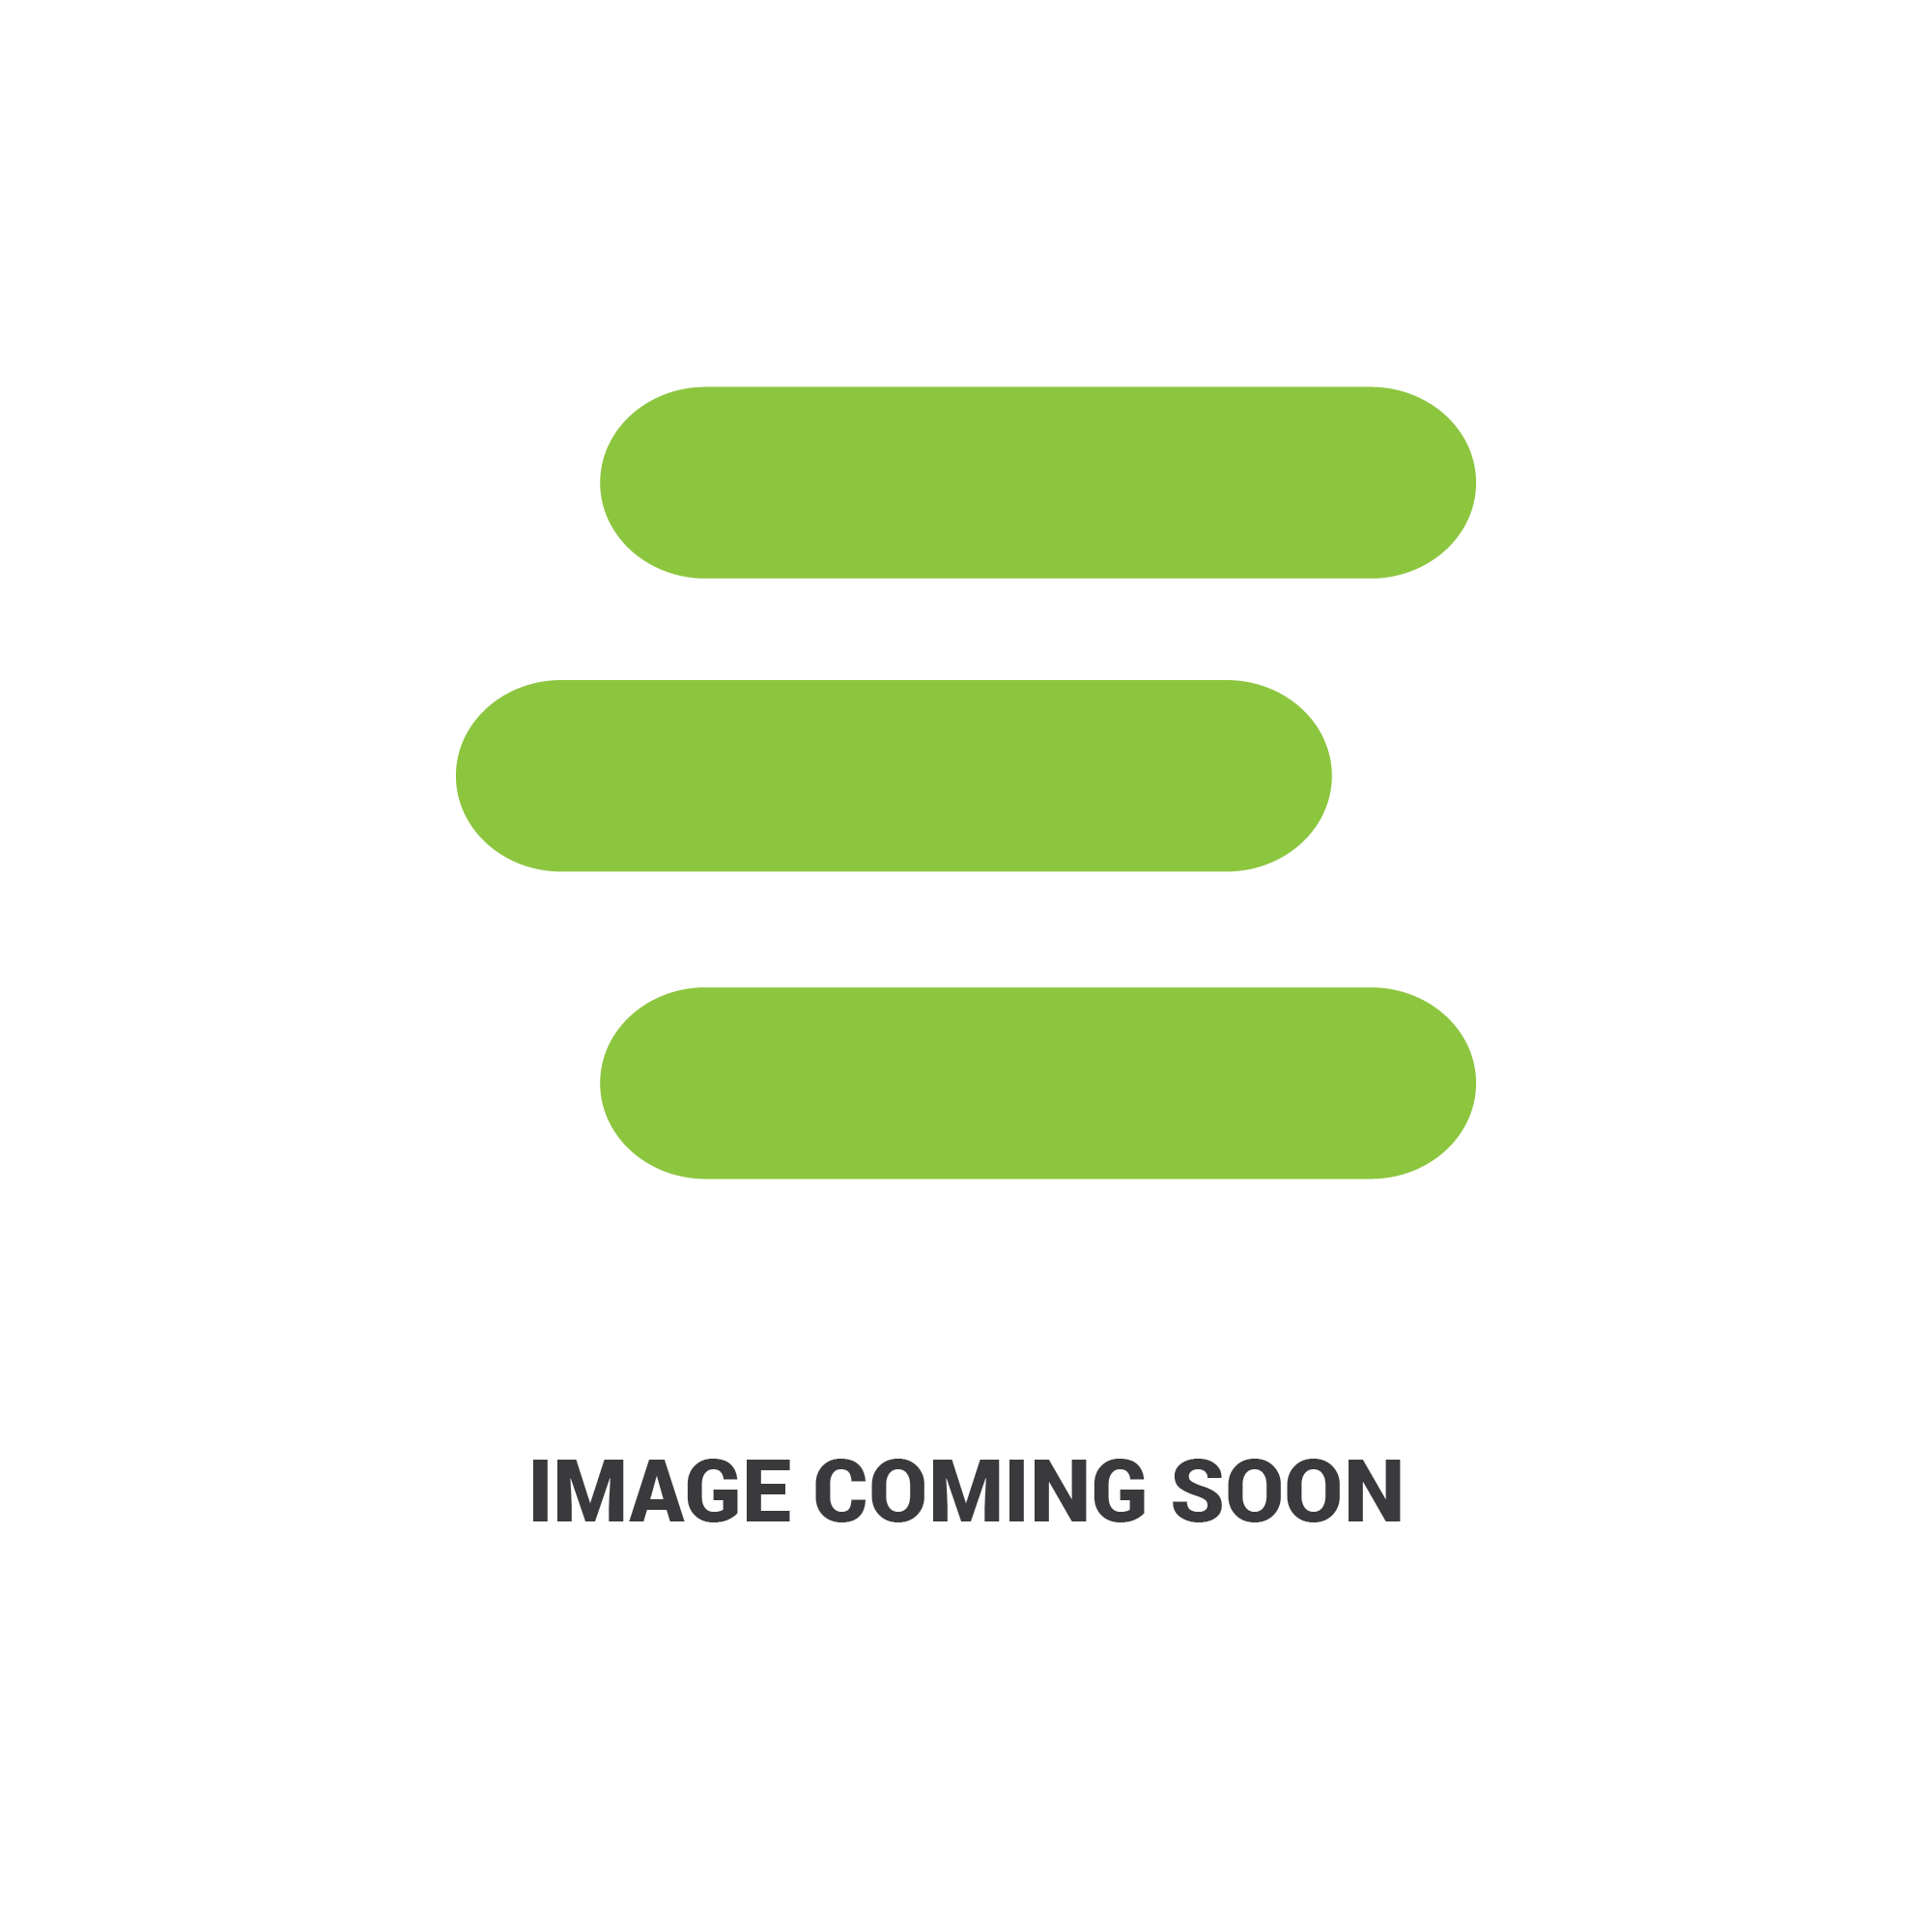 E-604664edit 4.jpg